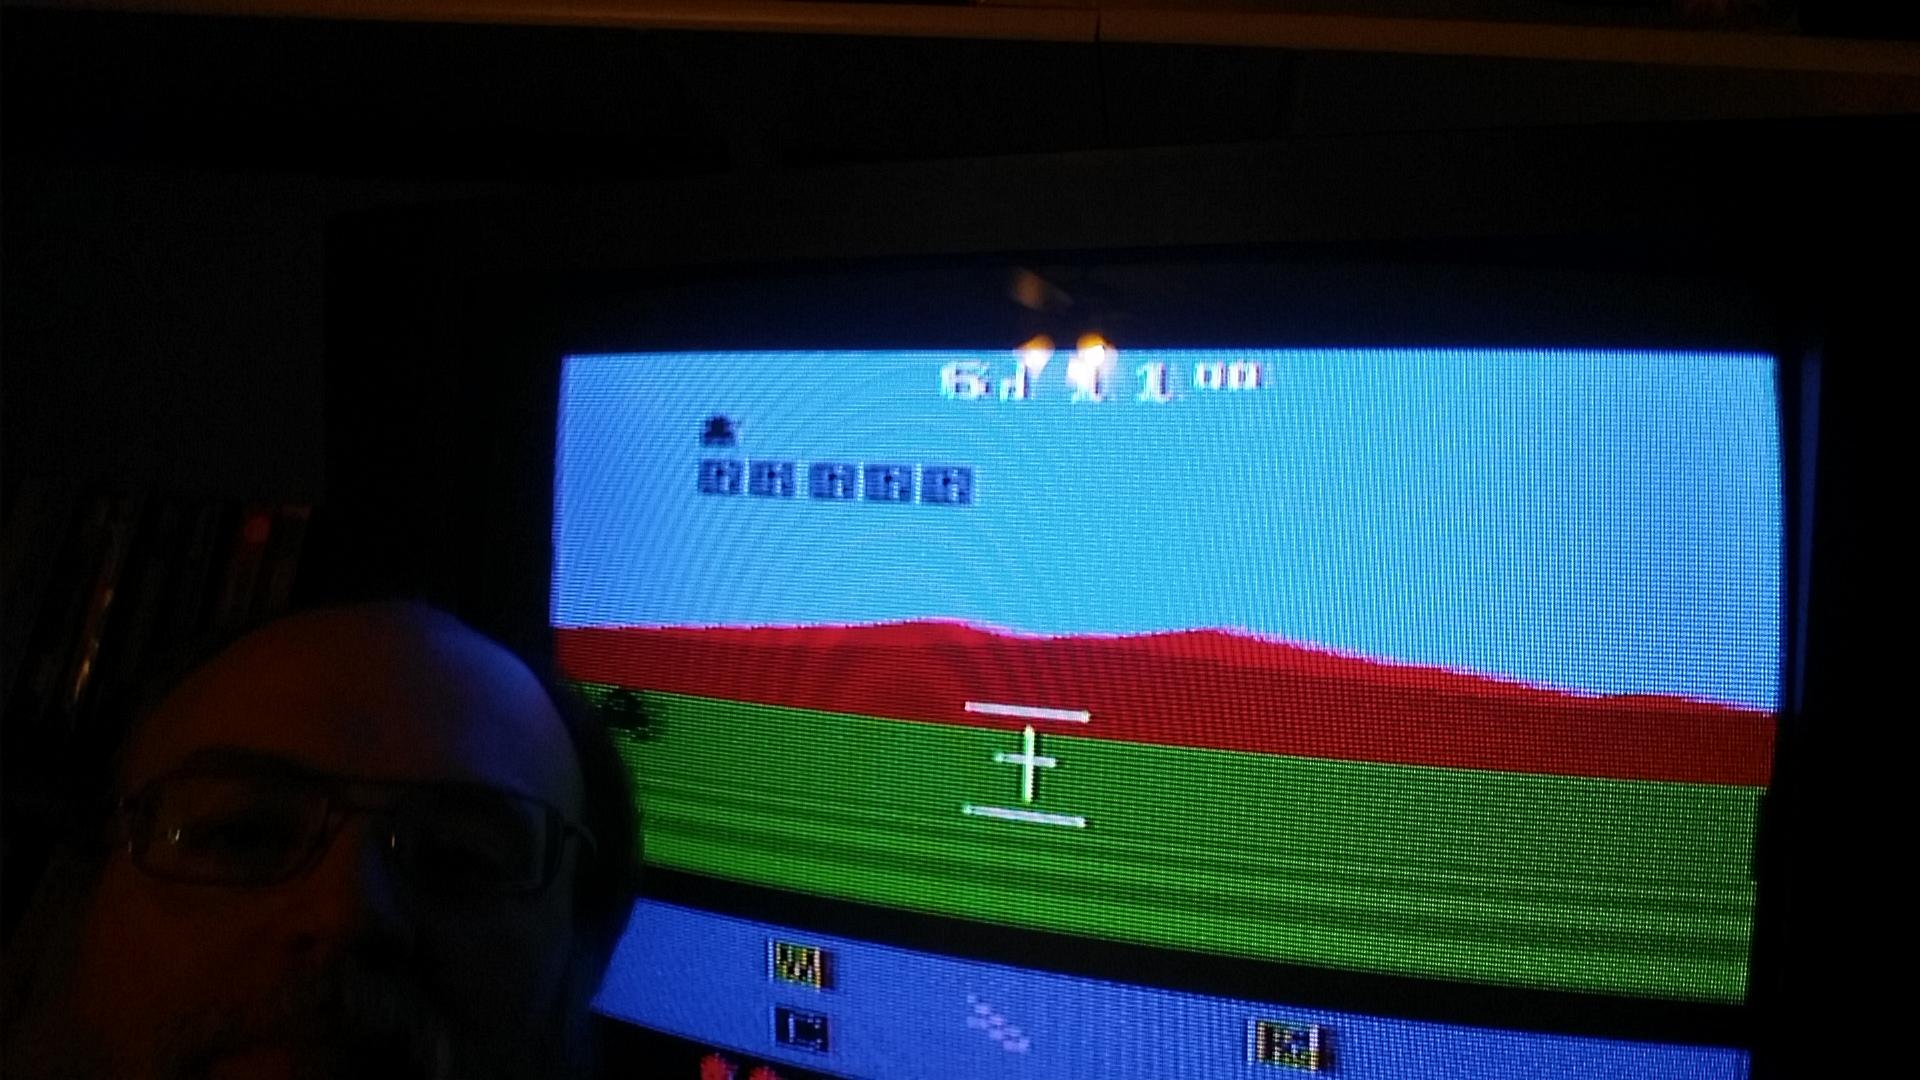 SeanStewart: Robot Tank (Atari 2600 Novice/B) 61 points on 2016-12-17 22:58:47